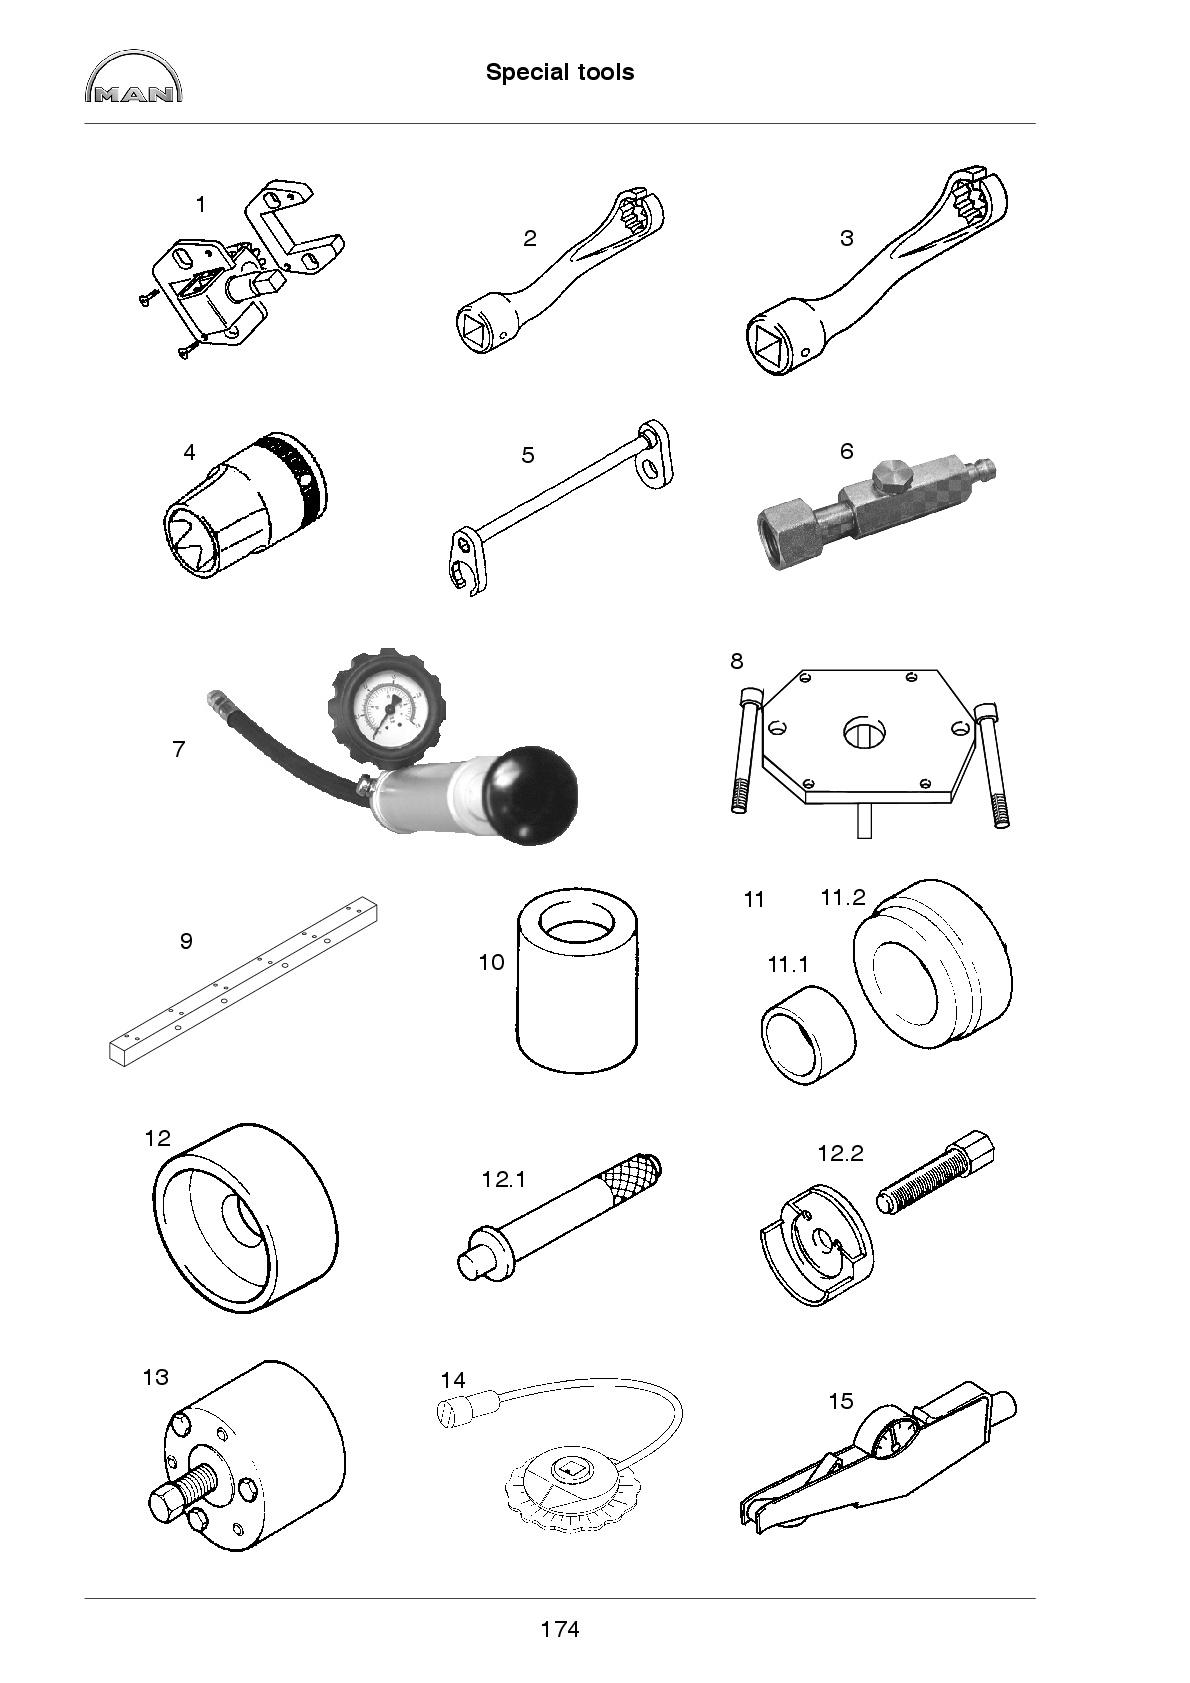 Man Marine Diesel Engine Workshop Service Repair Manual R6-800 R6-730 Series - Mhh Auto